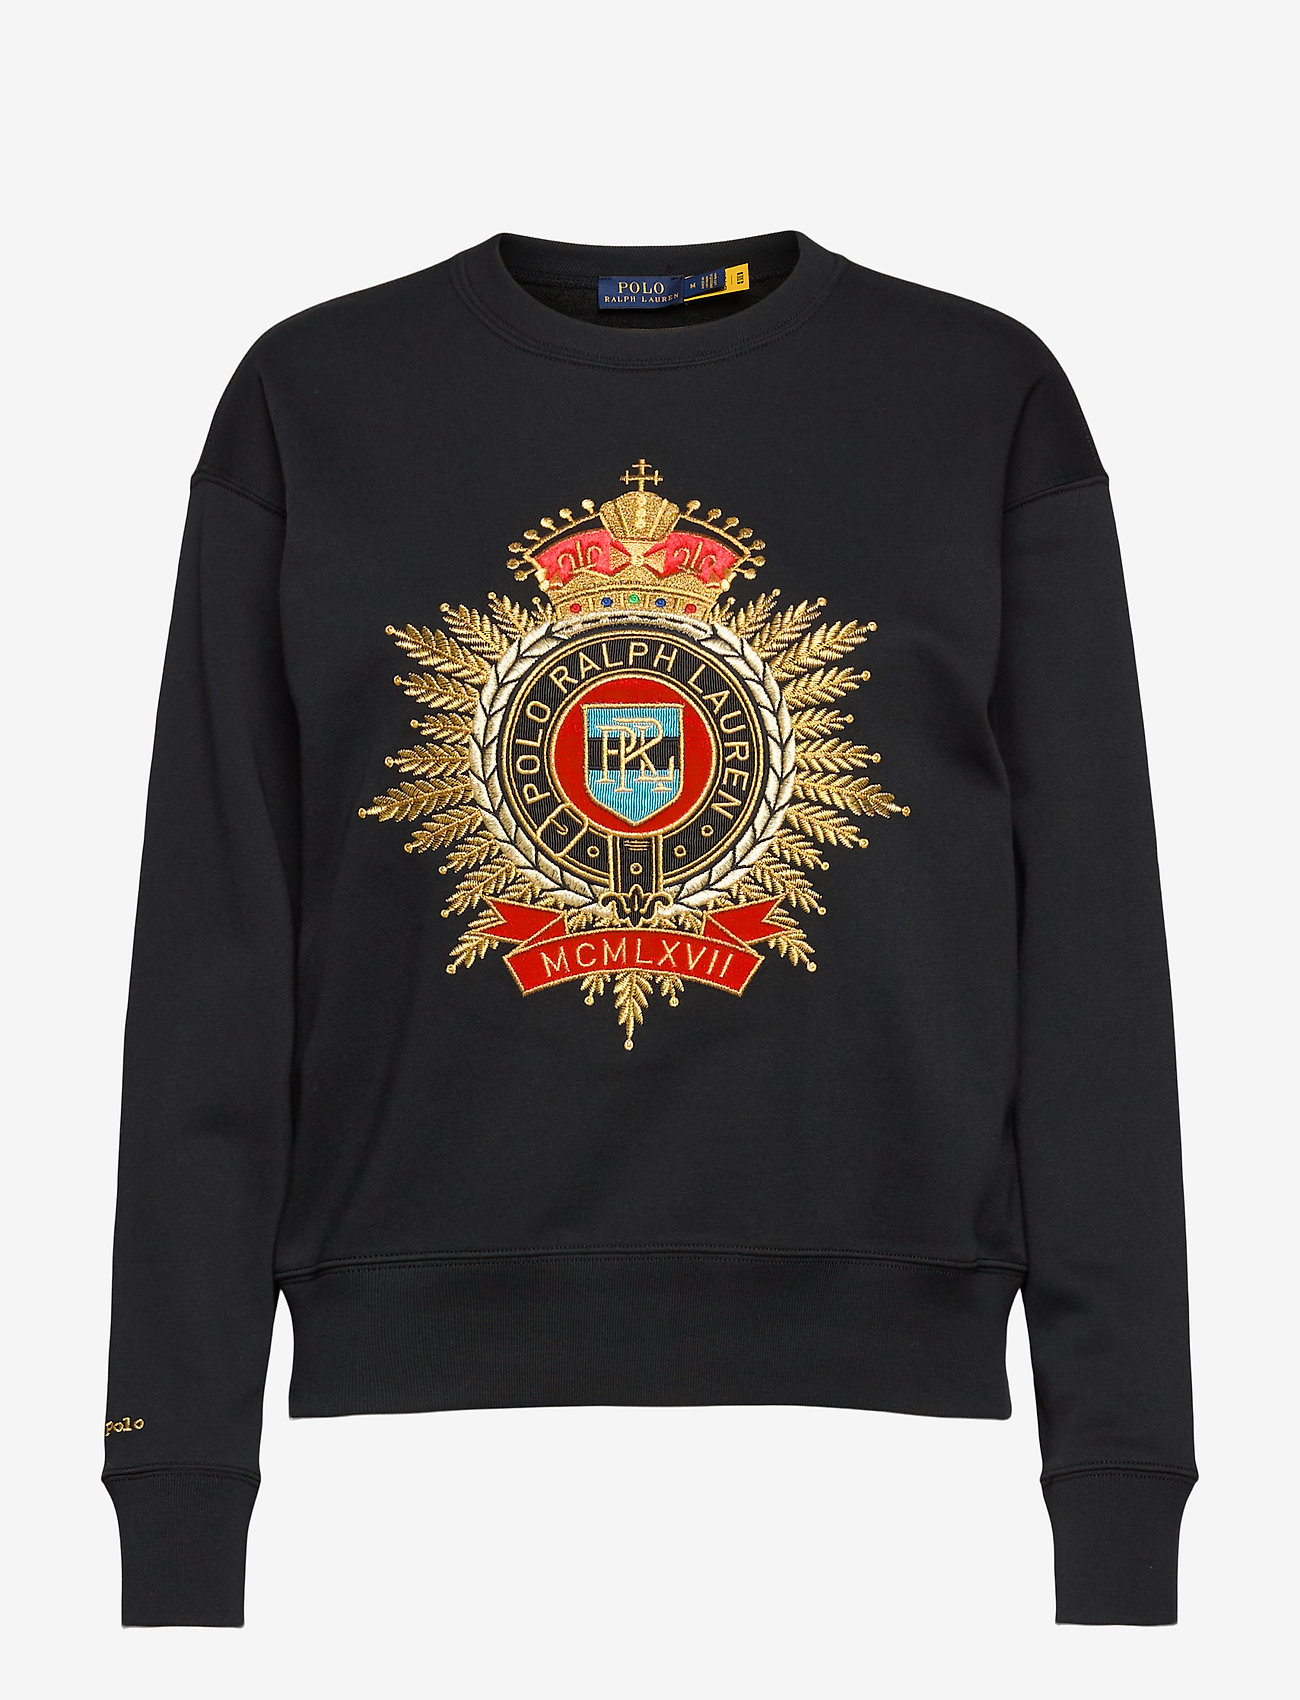 Polo Ralph Lauren - Lunar New Year Crest Sweatshirt - sweatshirts - polo black - 0